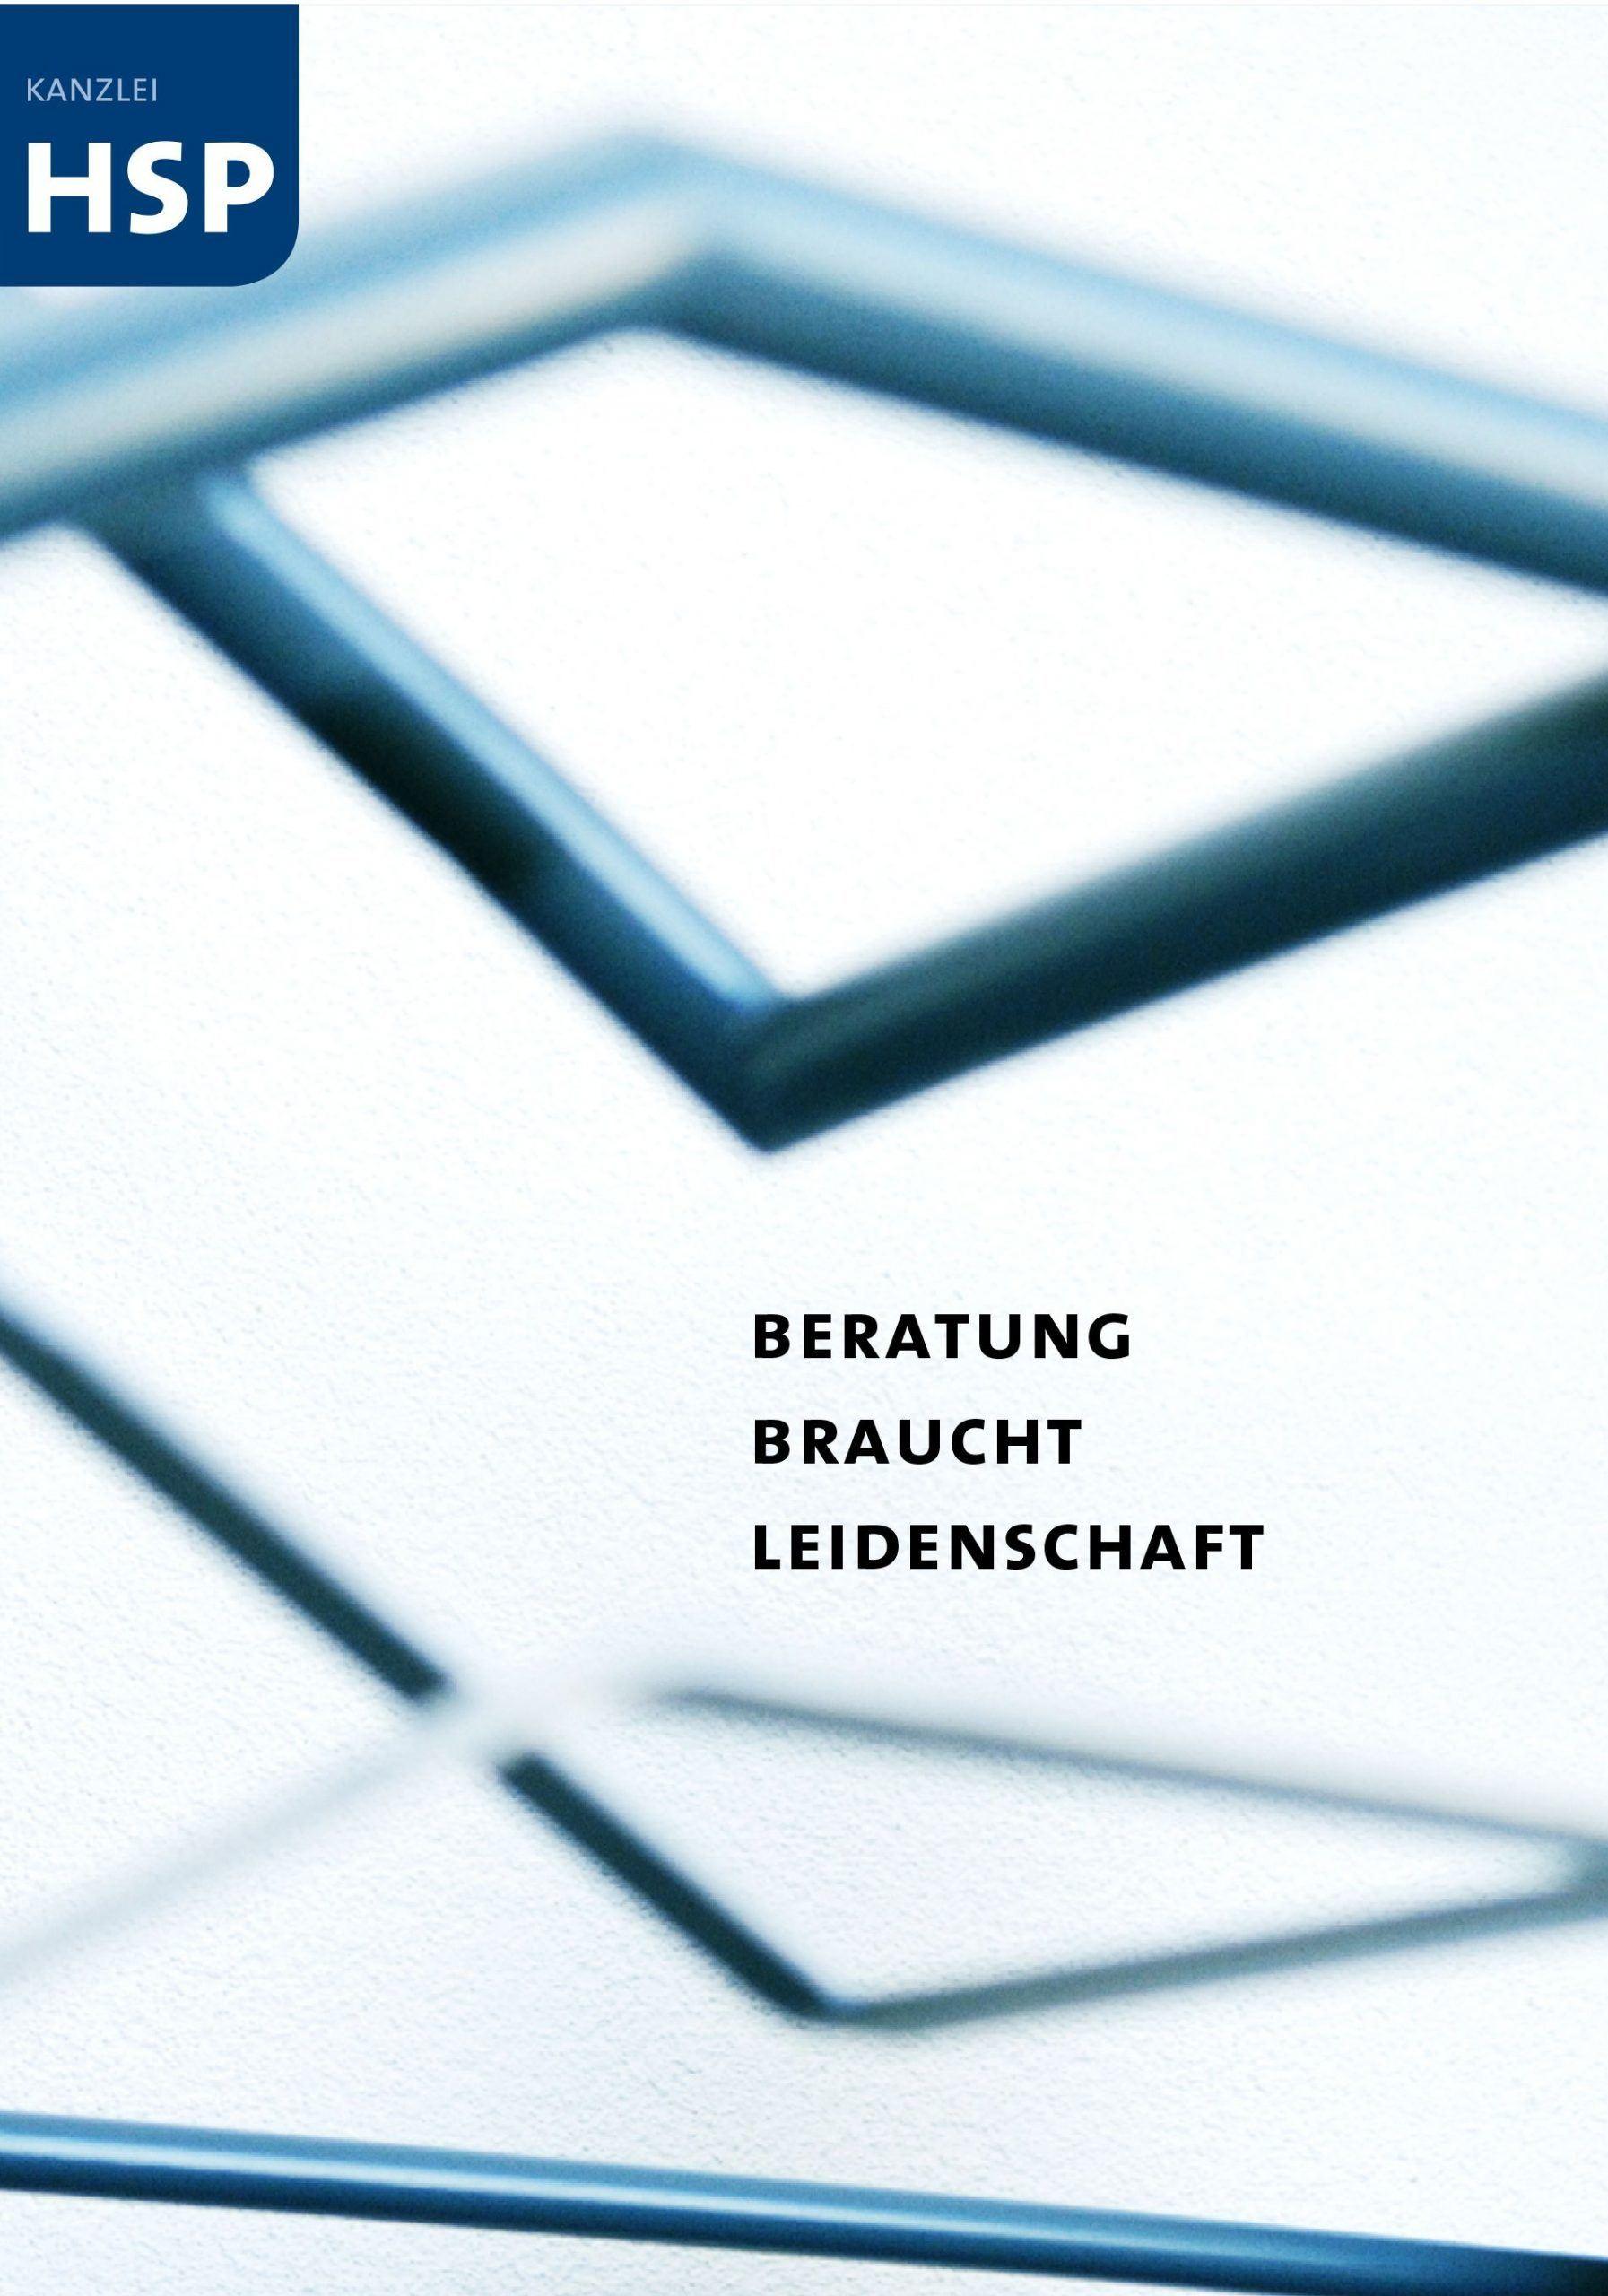 HSP Broschüre